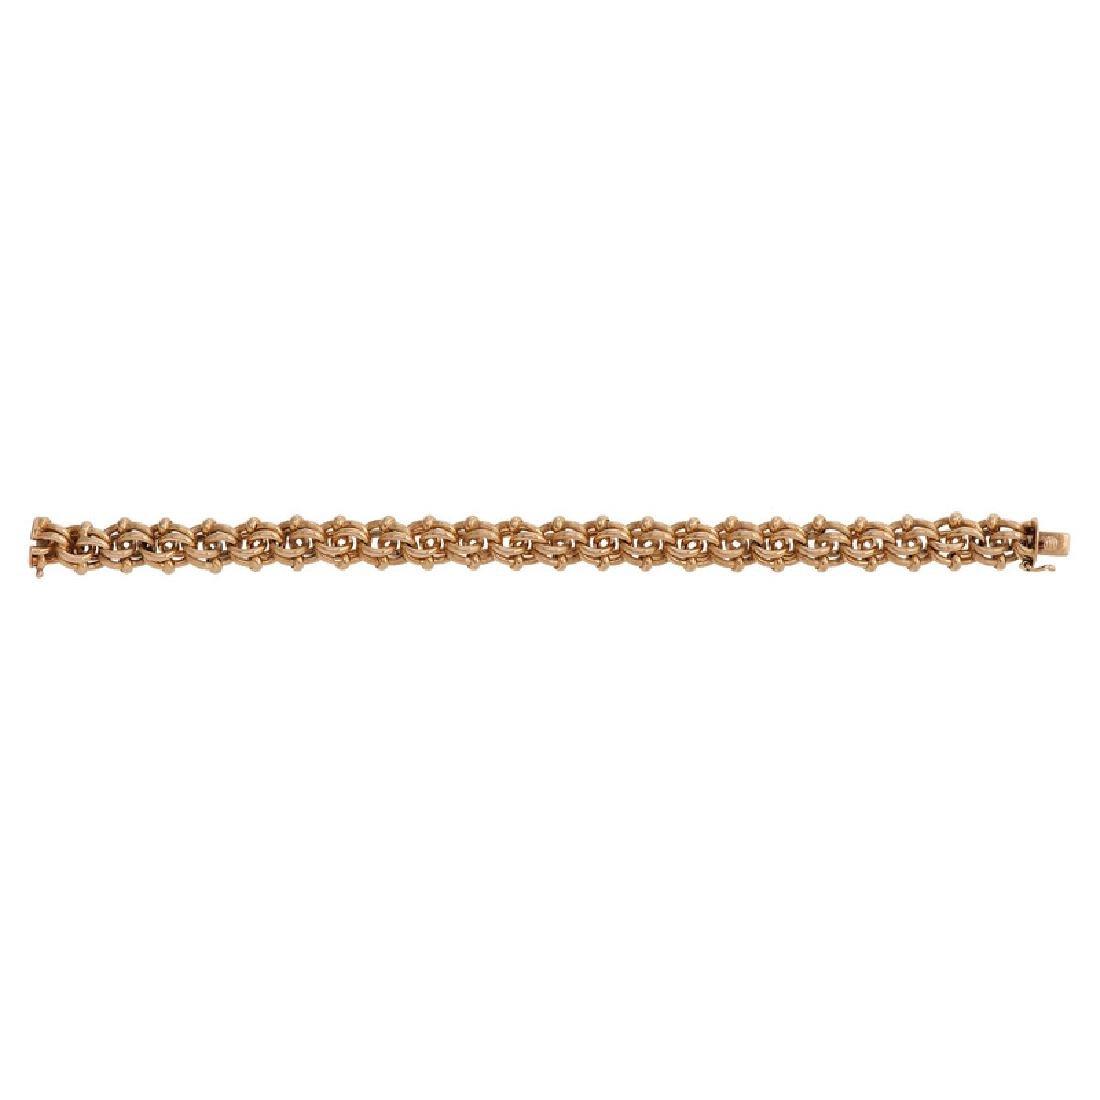 Tiffany & Co. 18 Karat Yellow Gold Bracelet